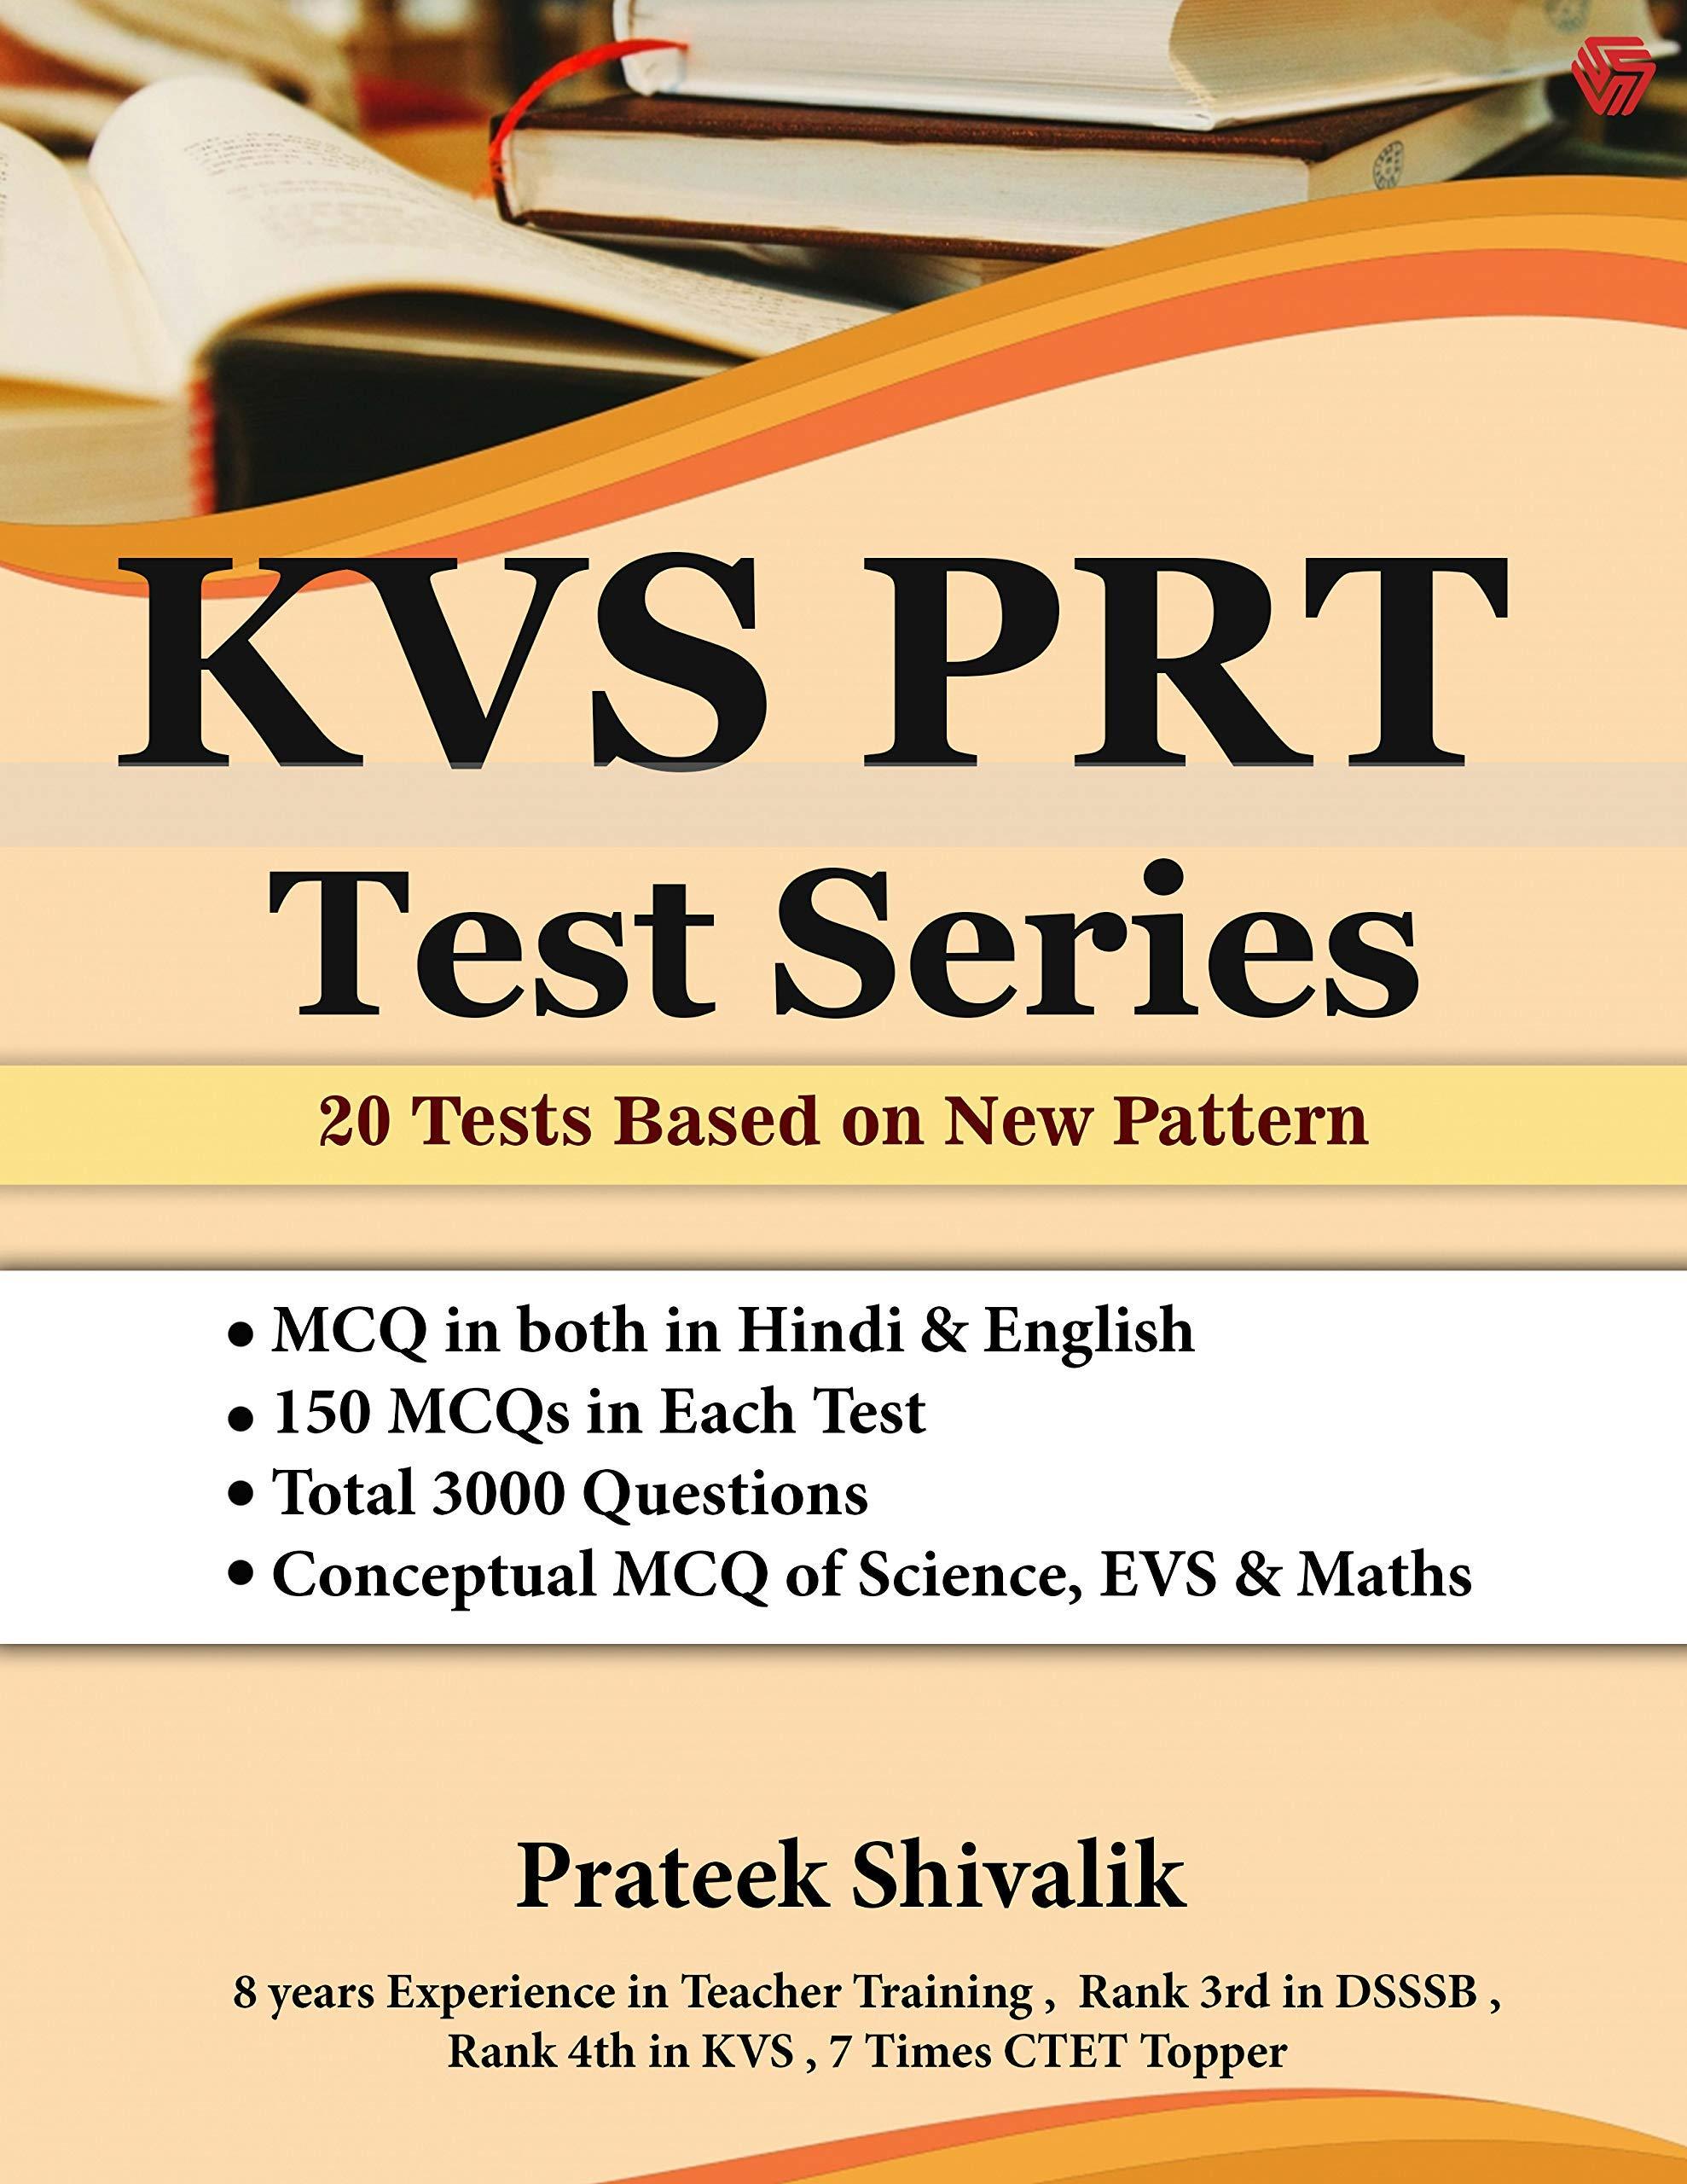 KVS PRT Test Series 20 Tests Based on New Pattern